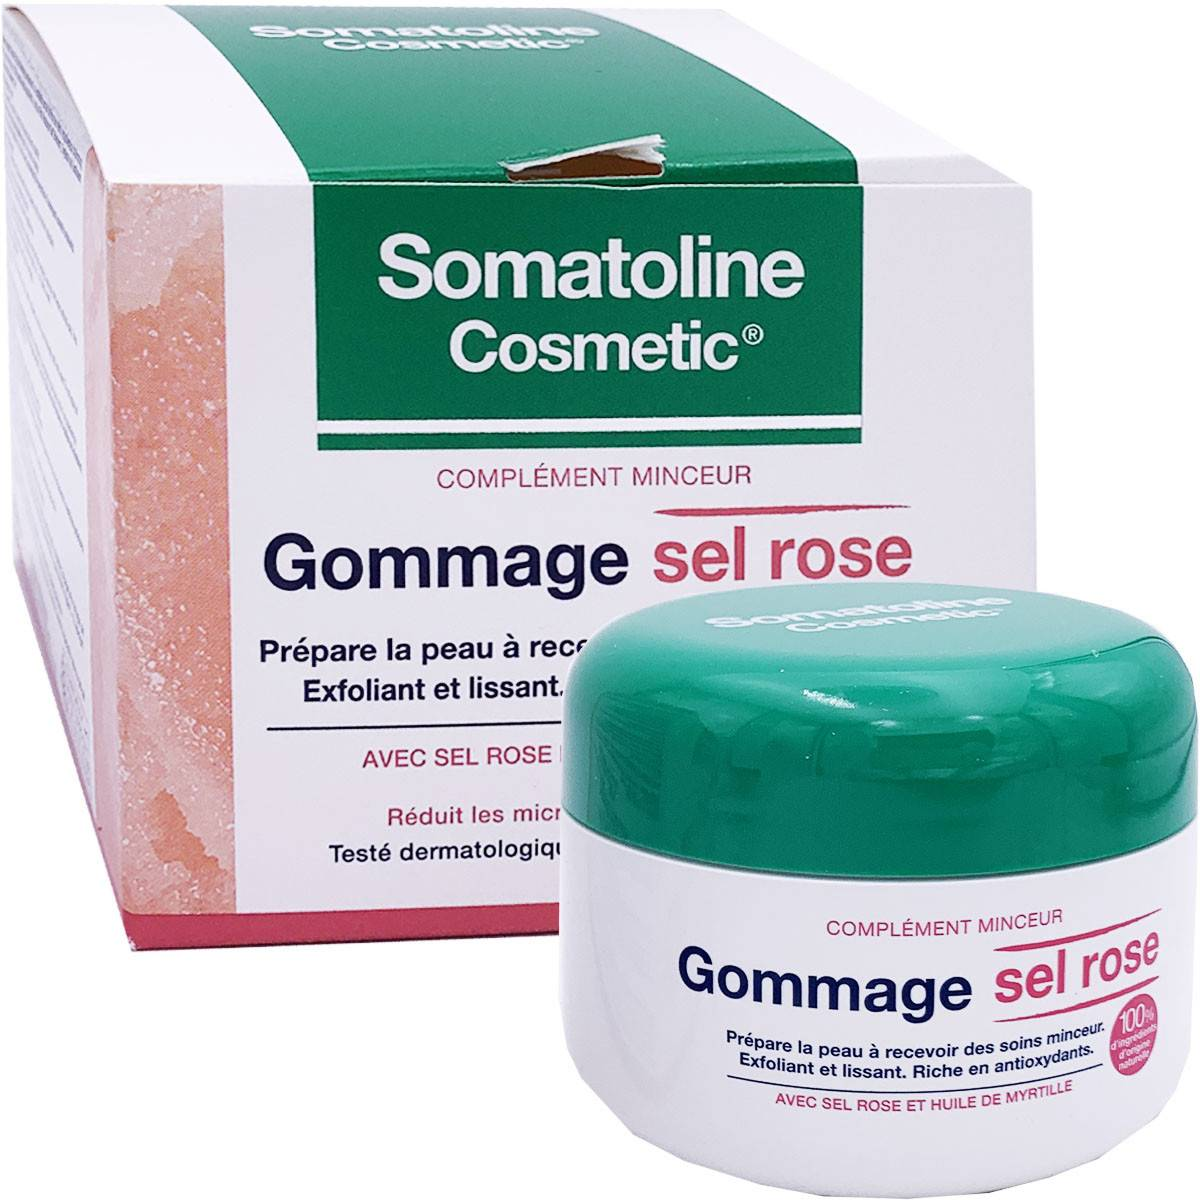 Somatoline gommage sel rose 350g